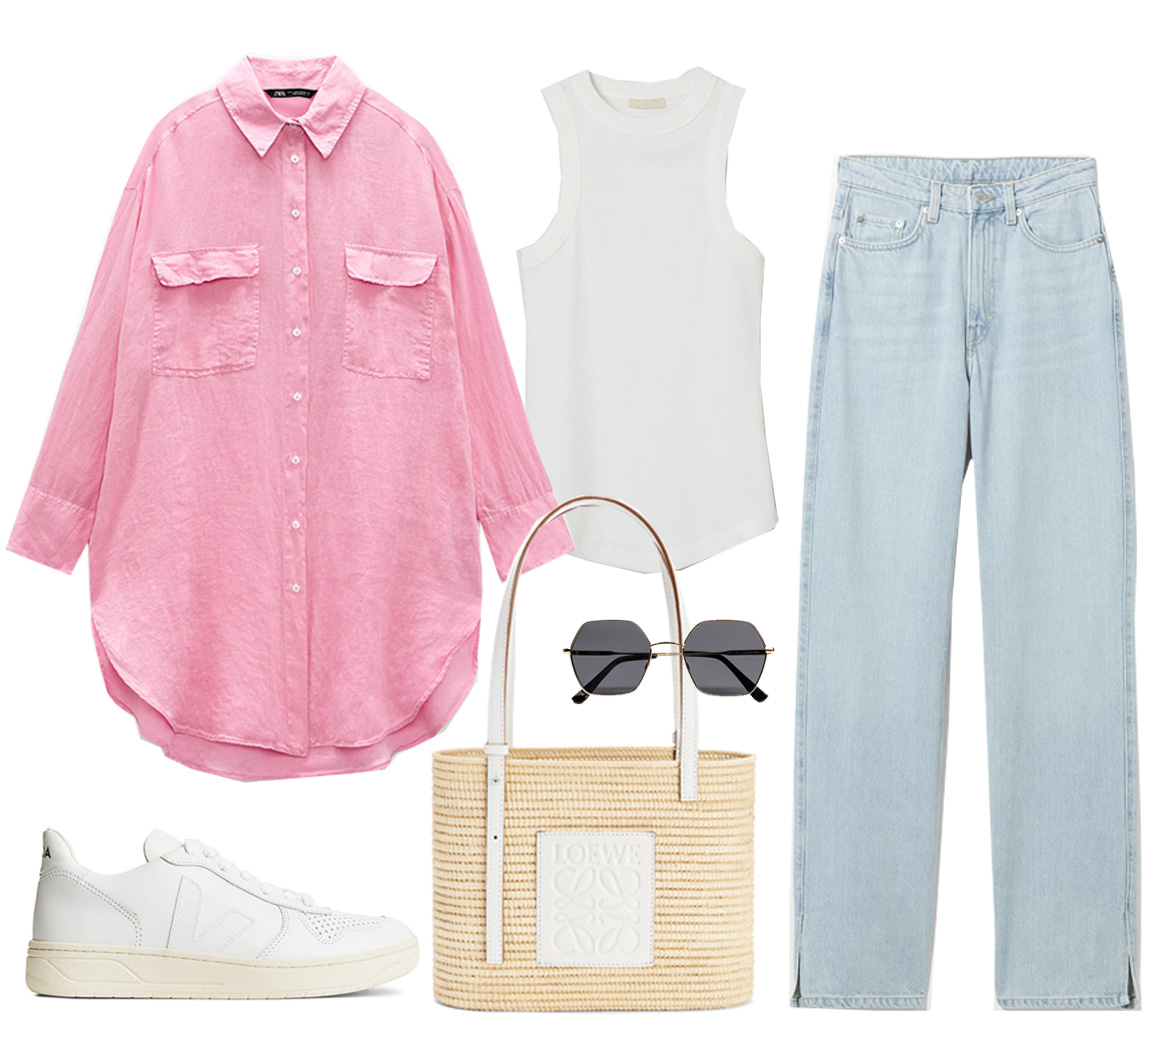 pink zara shirt outfit